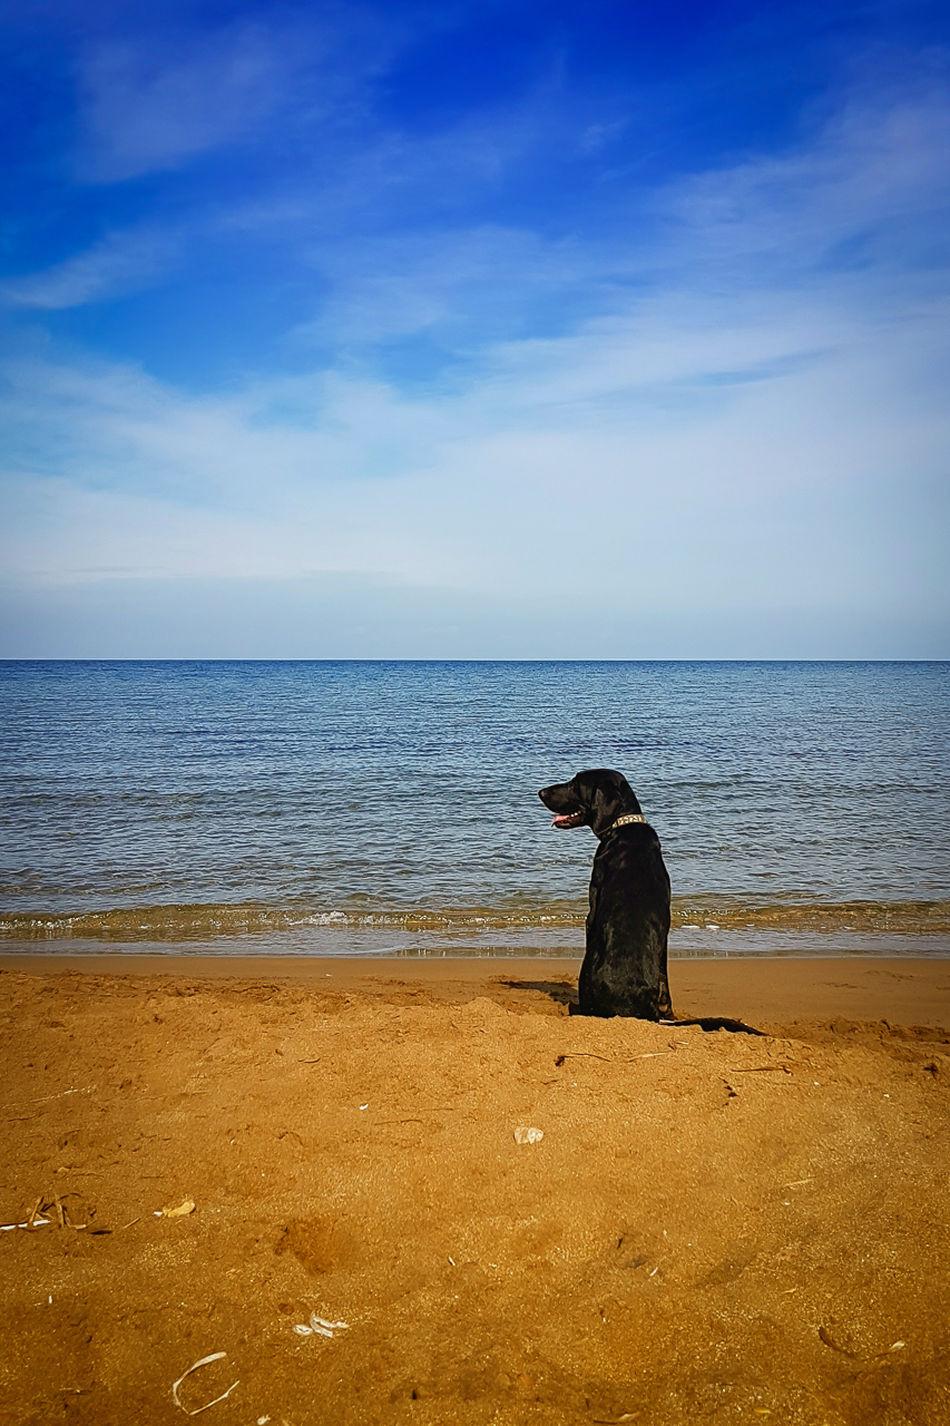 Dog on beach Beach Beauty In Nature Cloud - Sky Dog Horizon Over Water One Animal Outdoors Pet Sand Scenics Sea Sea And Sky Sky Water